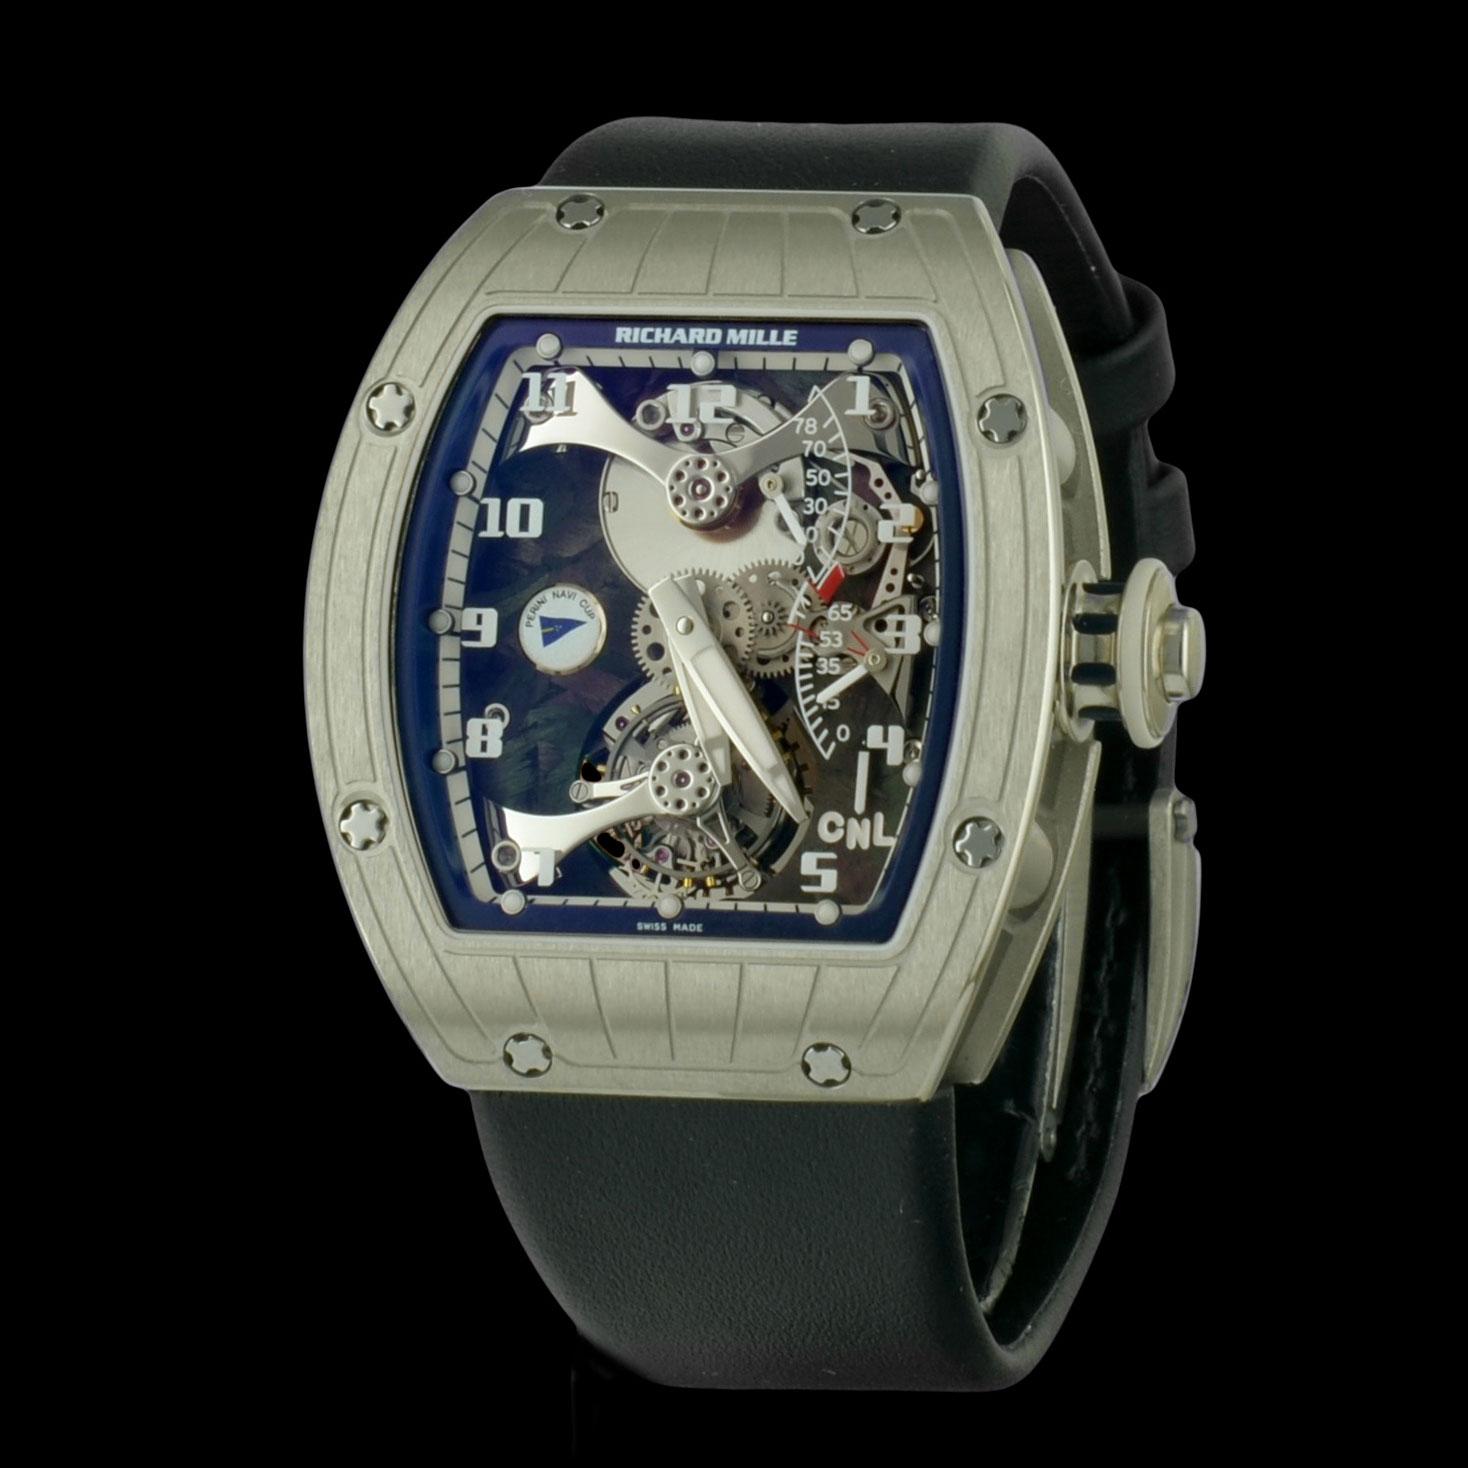 zoom_1-montre-richard-mille-rm-014-tourbillon-perini-navy-cup-26910